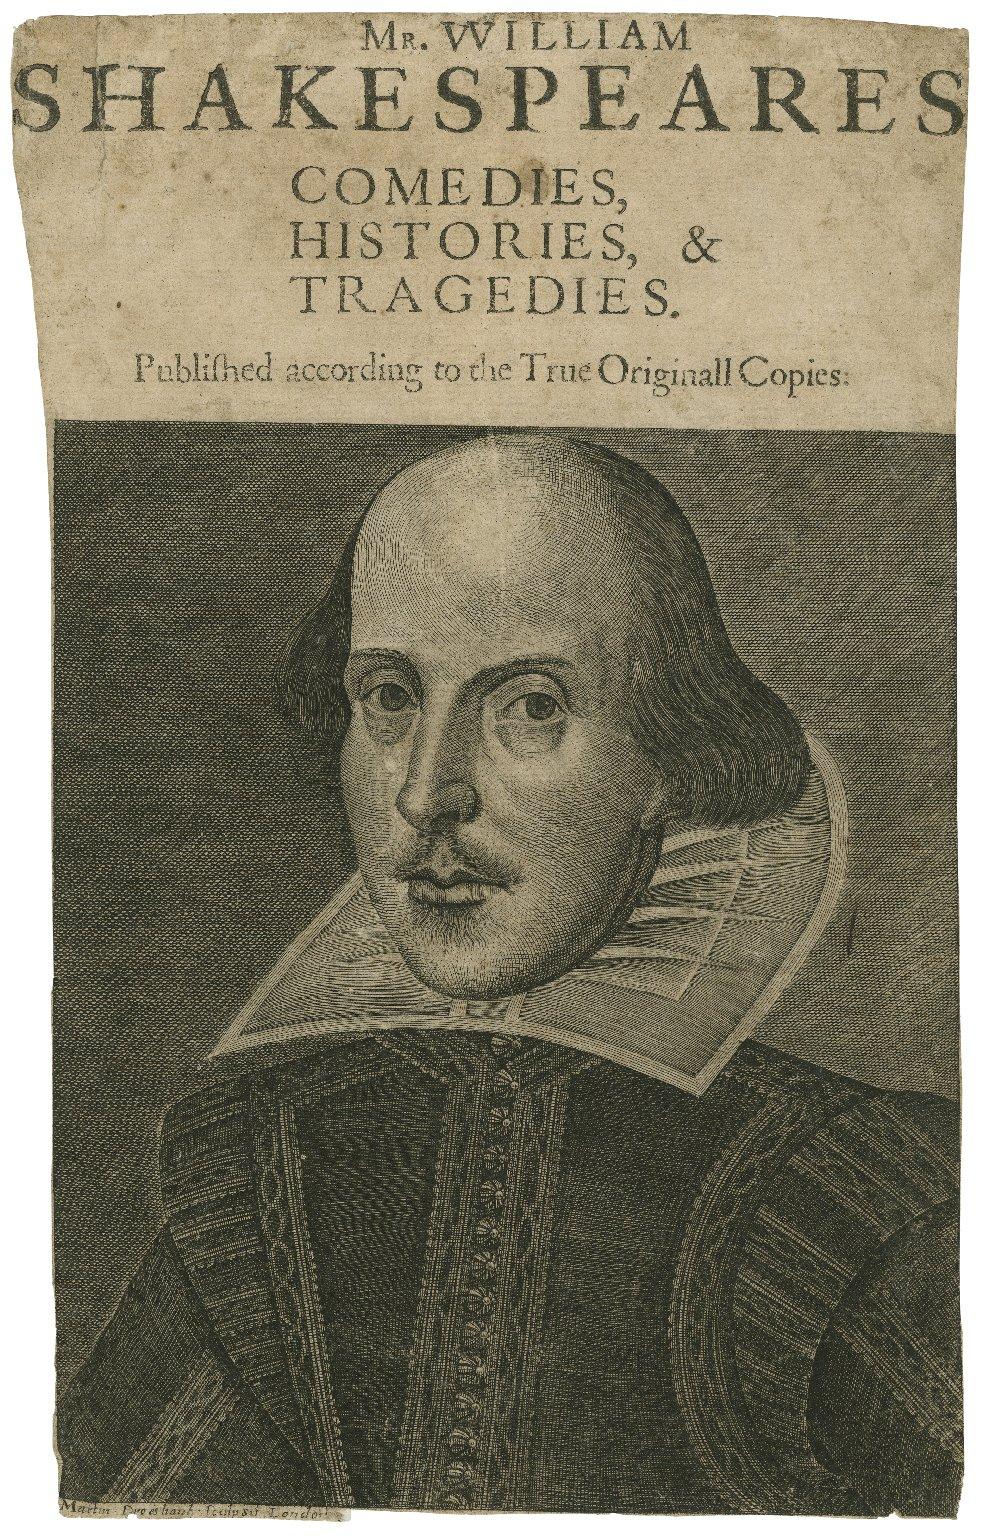 [Droeshout portrait of Shakespeare] [graphic] / Martin Droeshout sculpsit London.